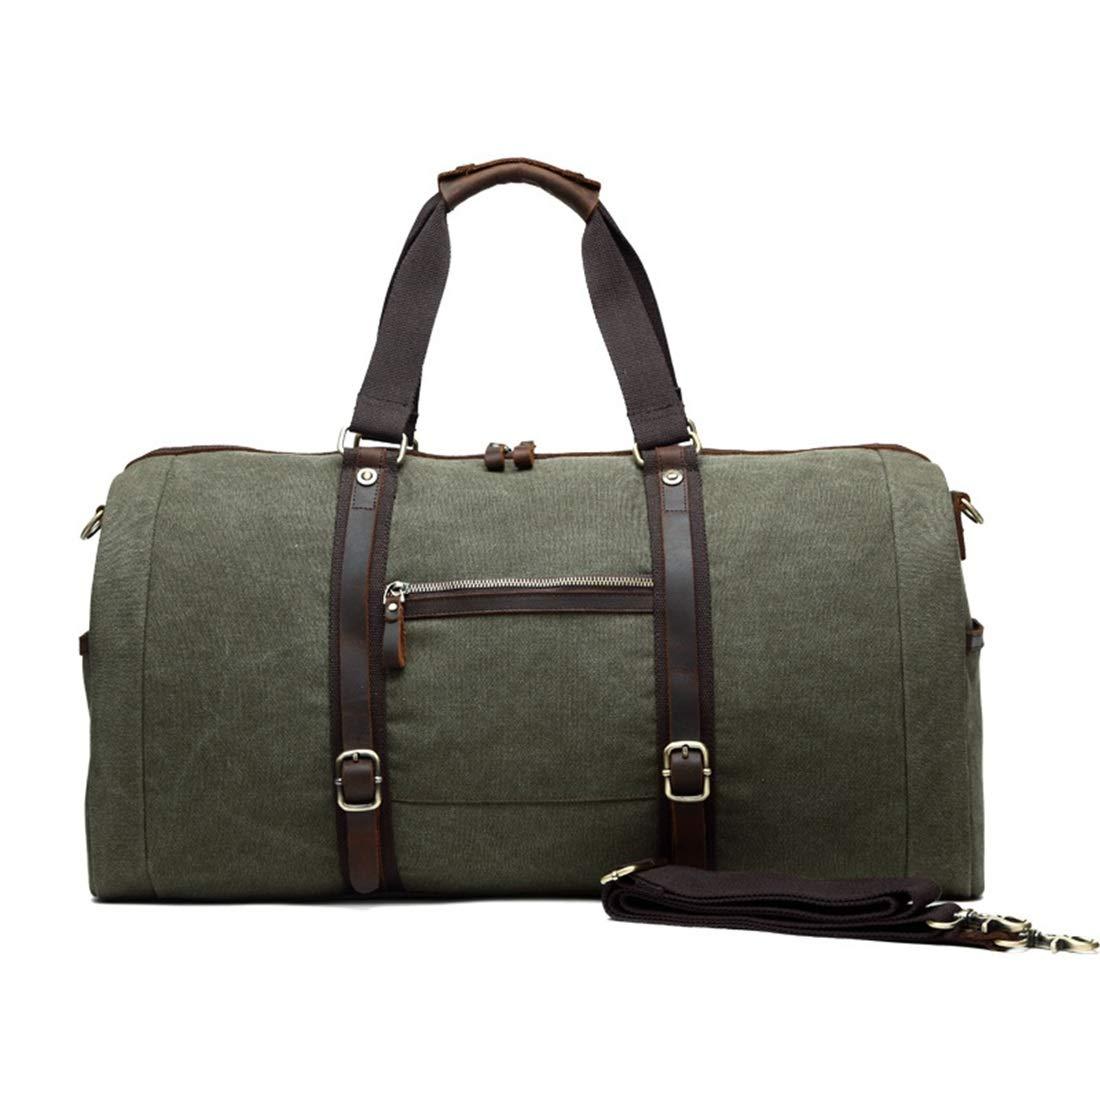 CeSuoLBD キャンバストラベルバッグ、旅行大容量ハンドバッグ、シングルショルダースキュー、多機能荷物袋、カジュアルメンズキャンバスメンズバッグ。 (色 : アーミーグリーン) B07QZX383M